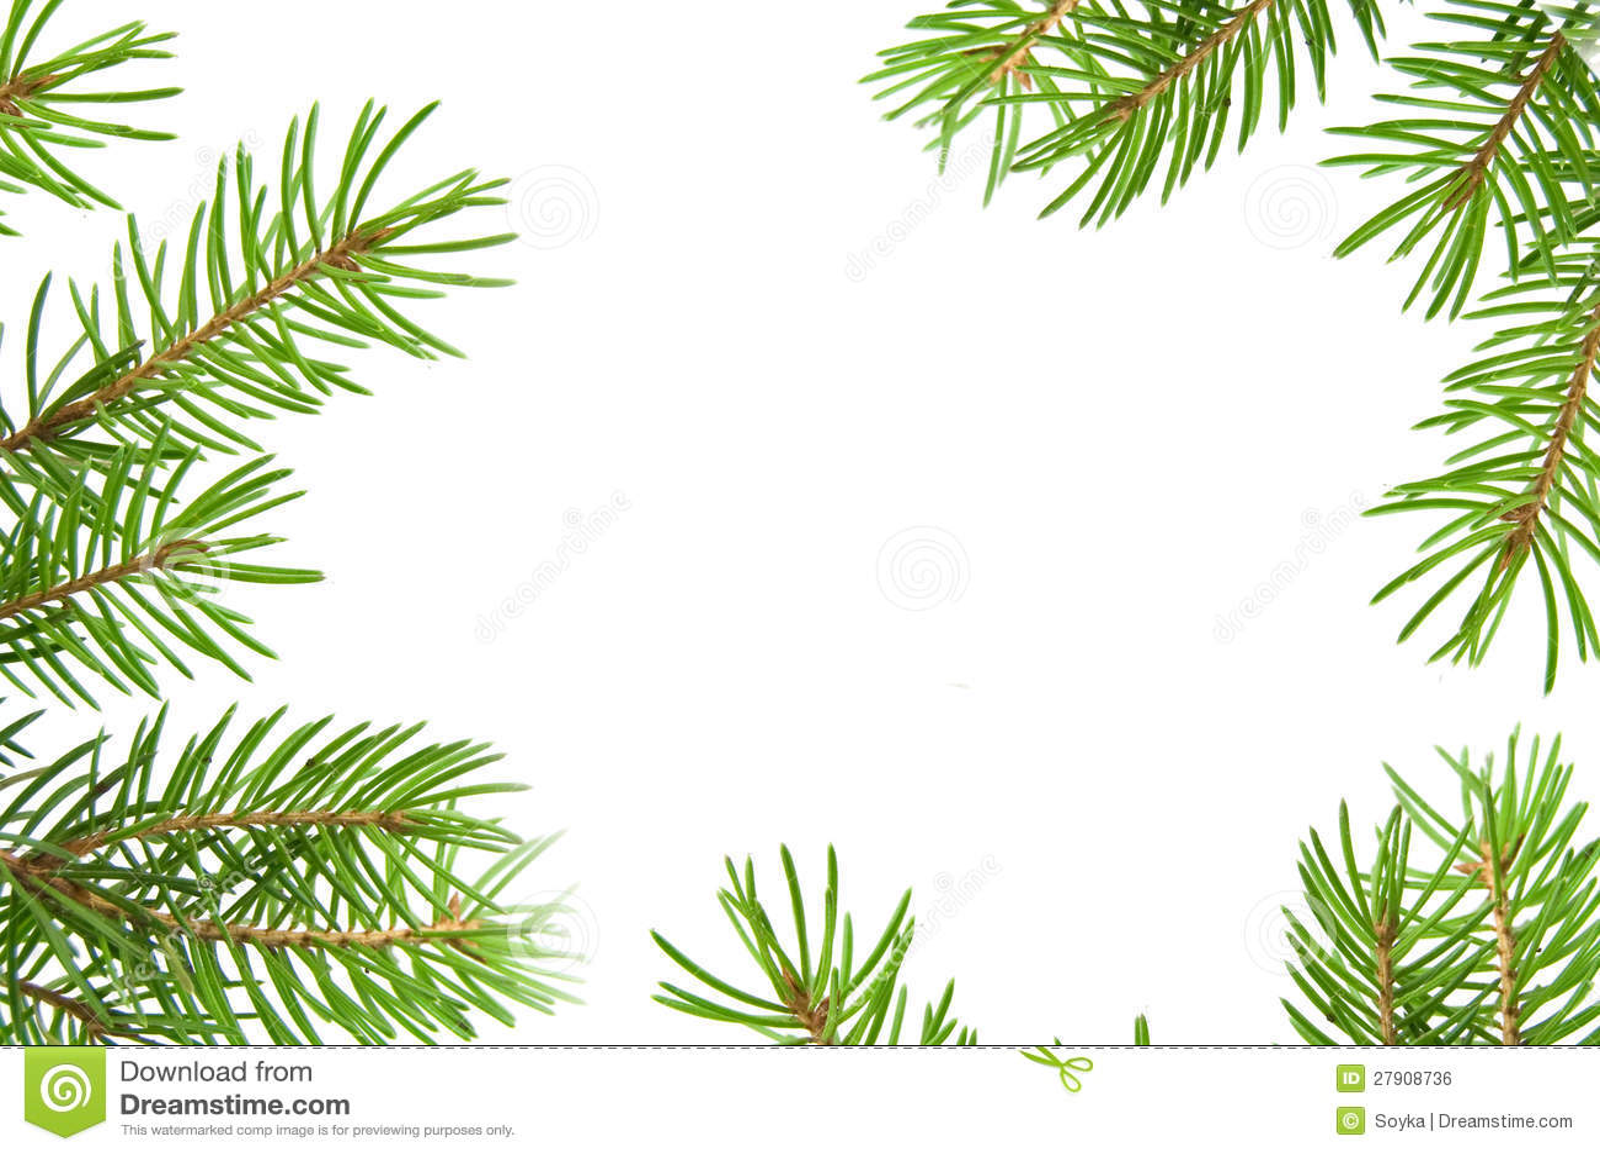 clipart tree branch borders - photo #28